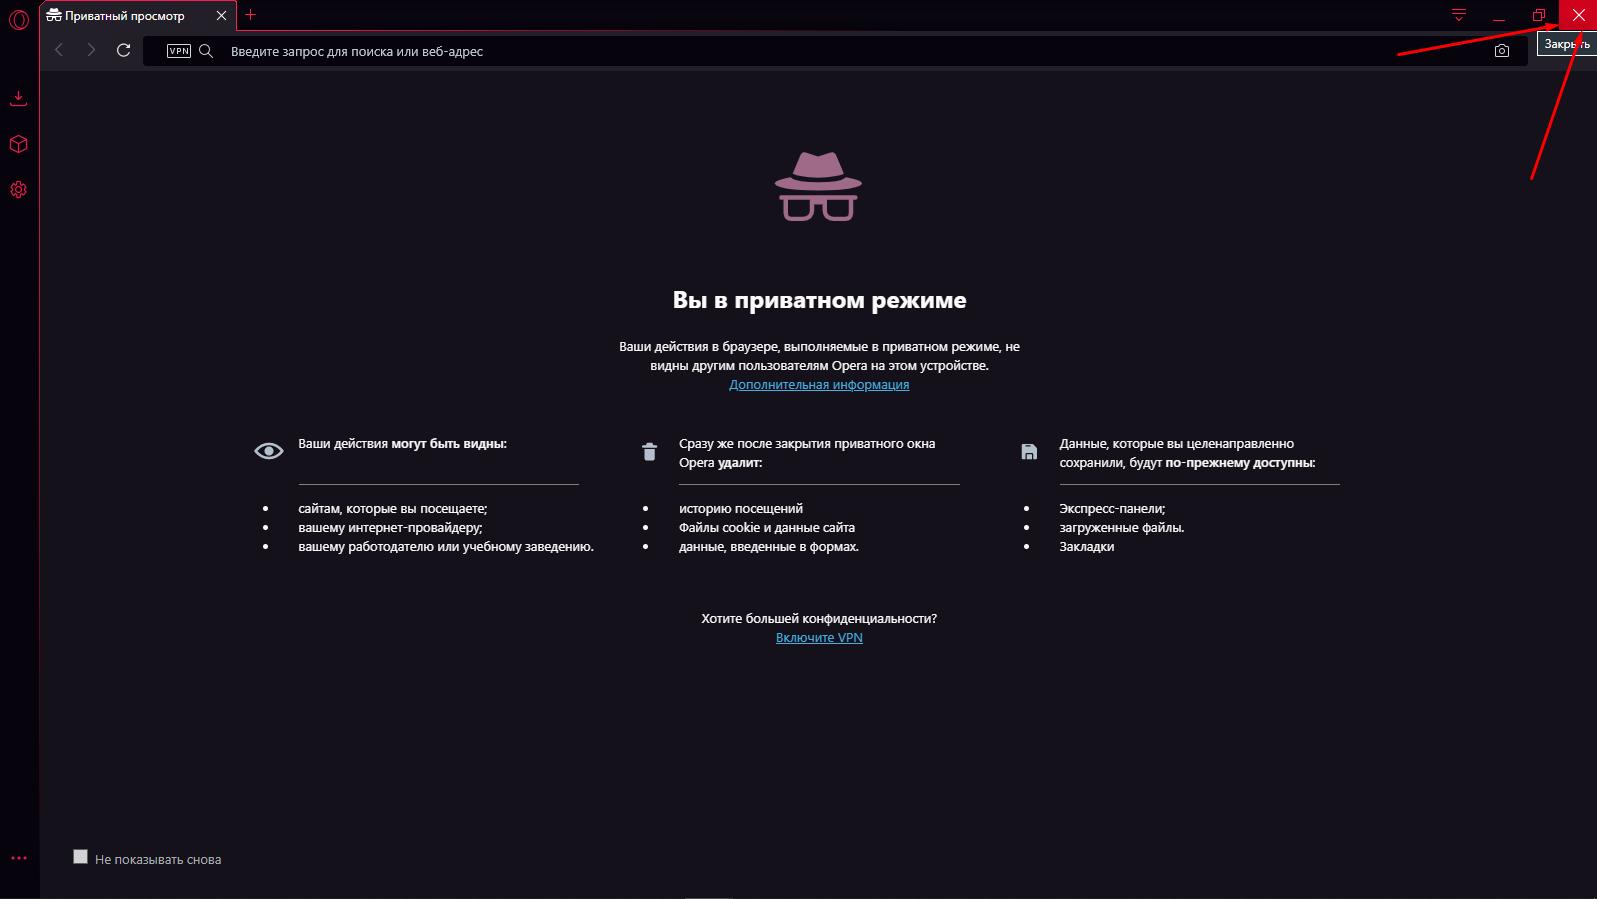 Окно приватного режима в браузере Opera GX